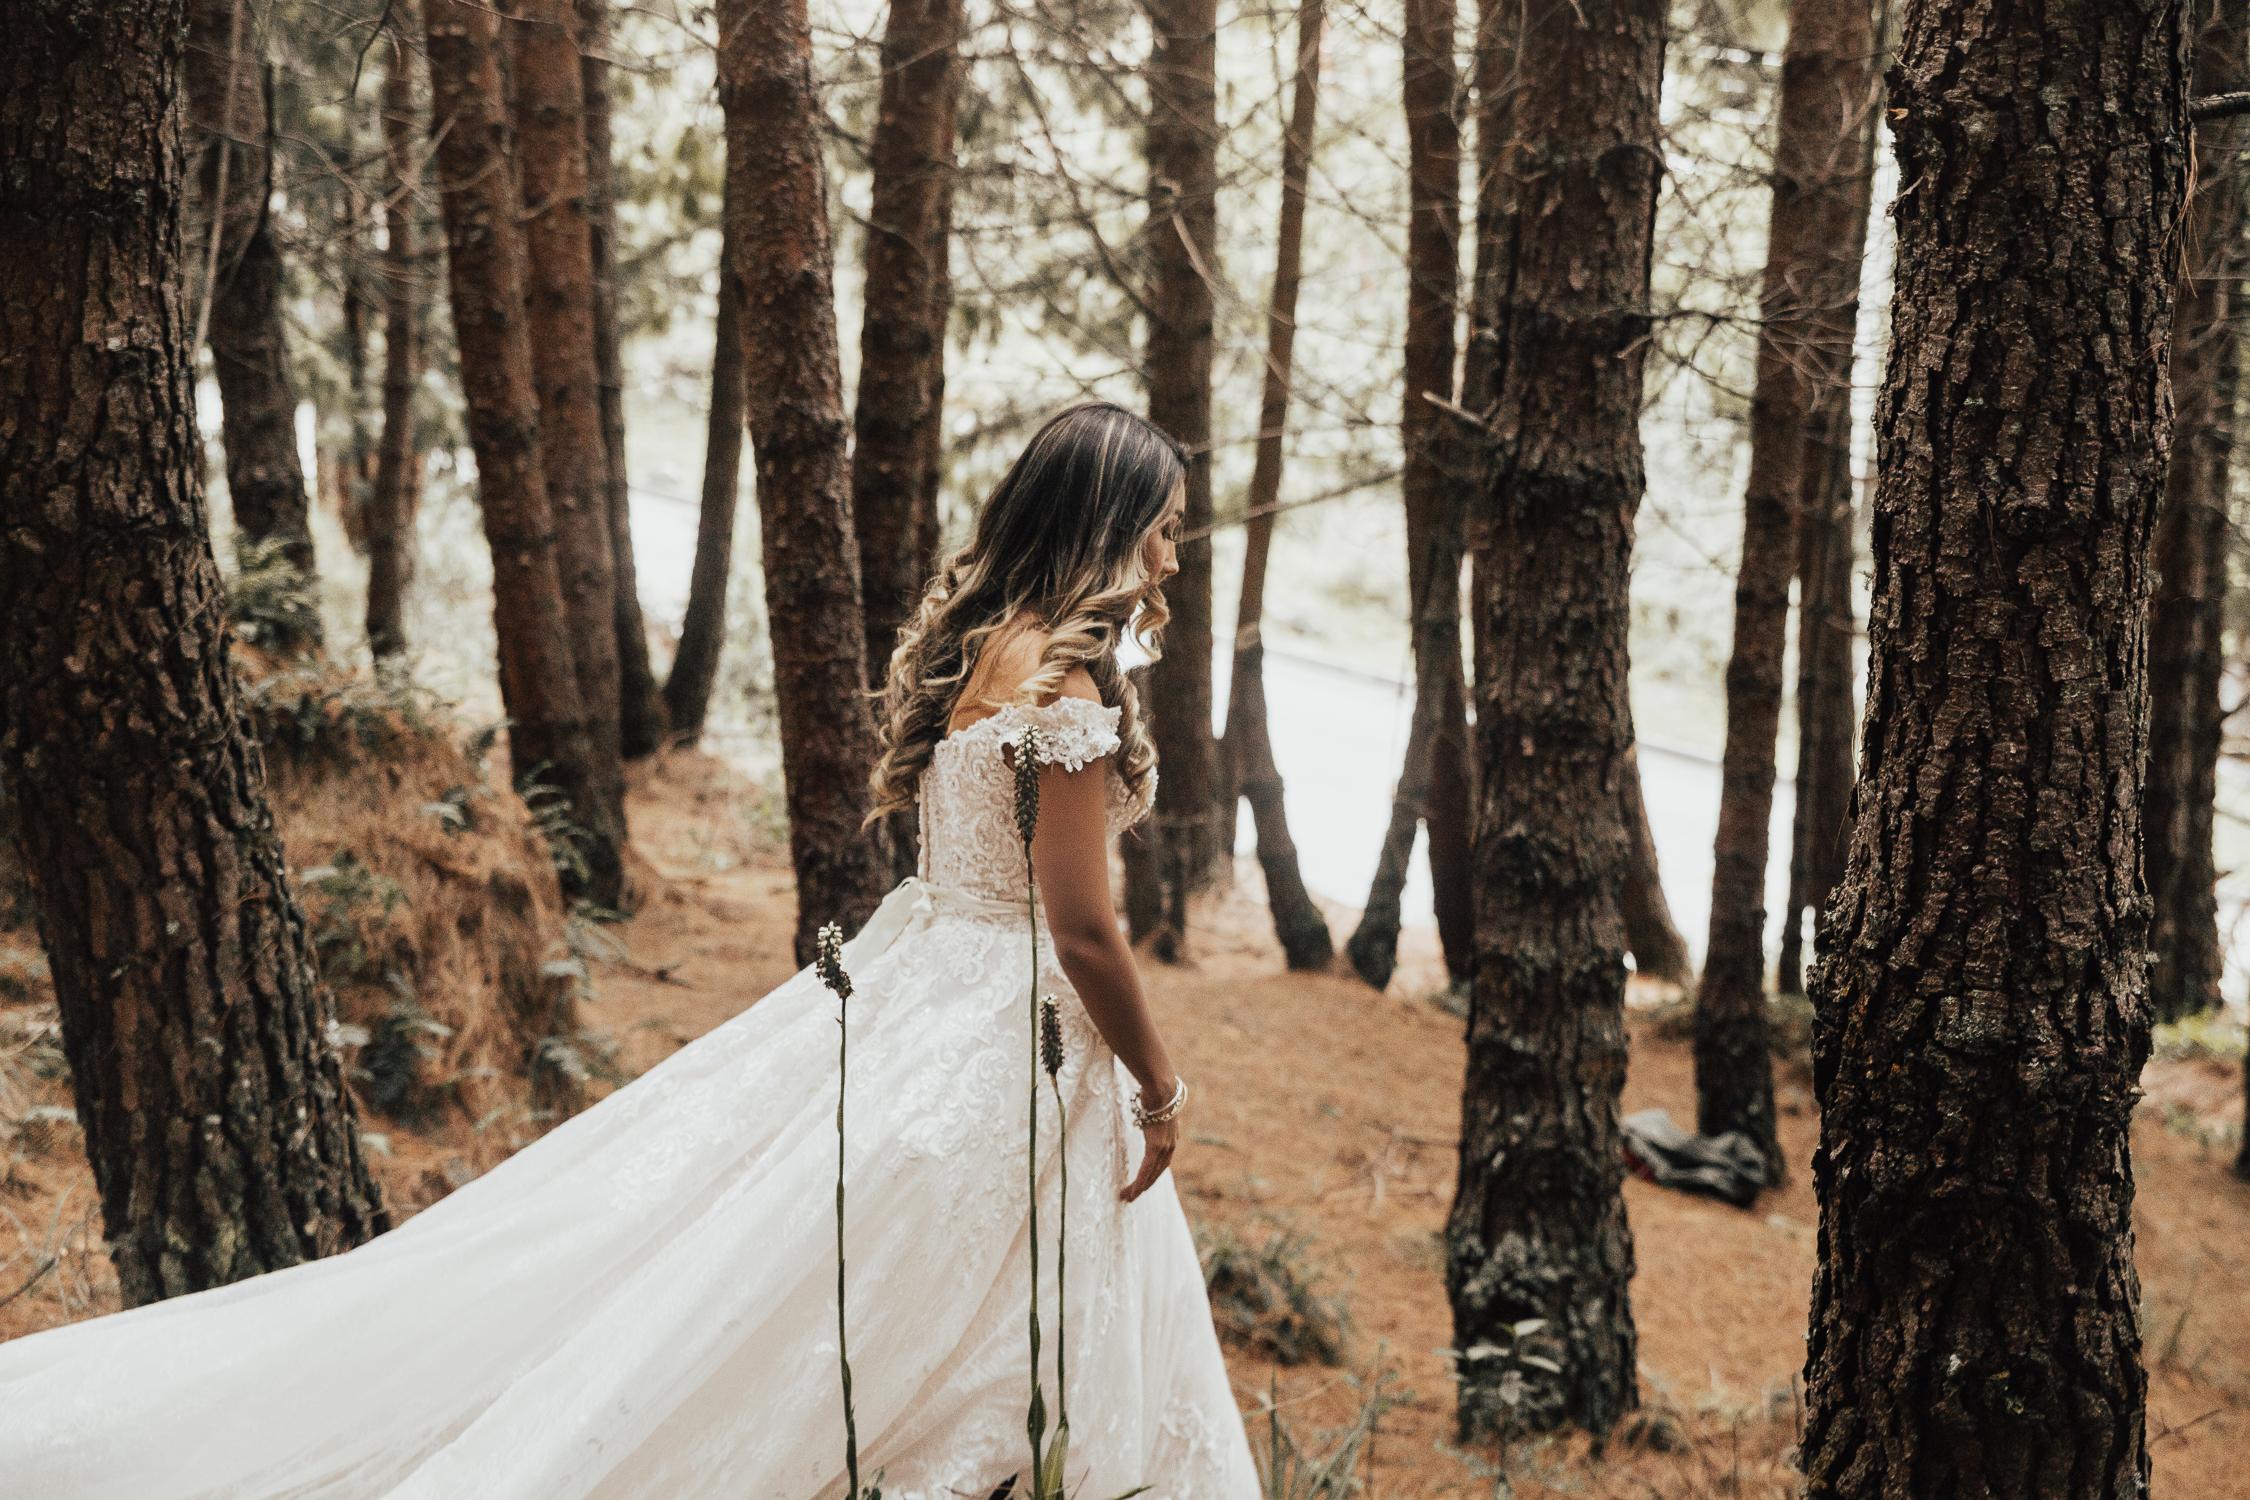 Michelle-Agurto-Fotografia-Bodas-Destination-Wedding-Photographer-Ecuador-Sesion-Johanna-Eduardo-63.JPG